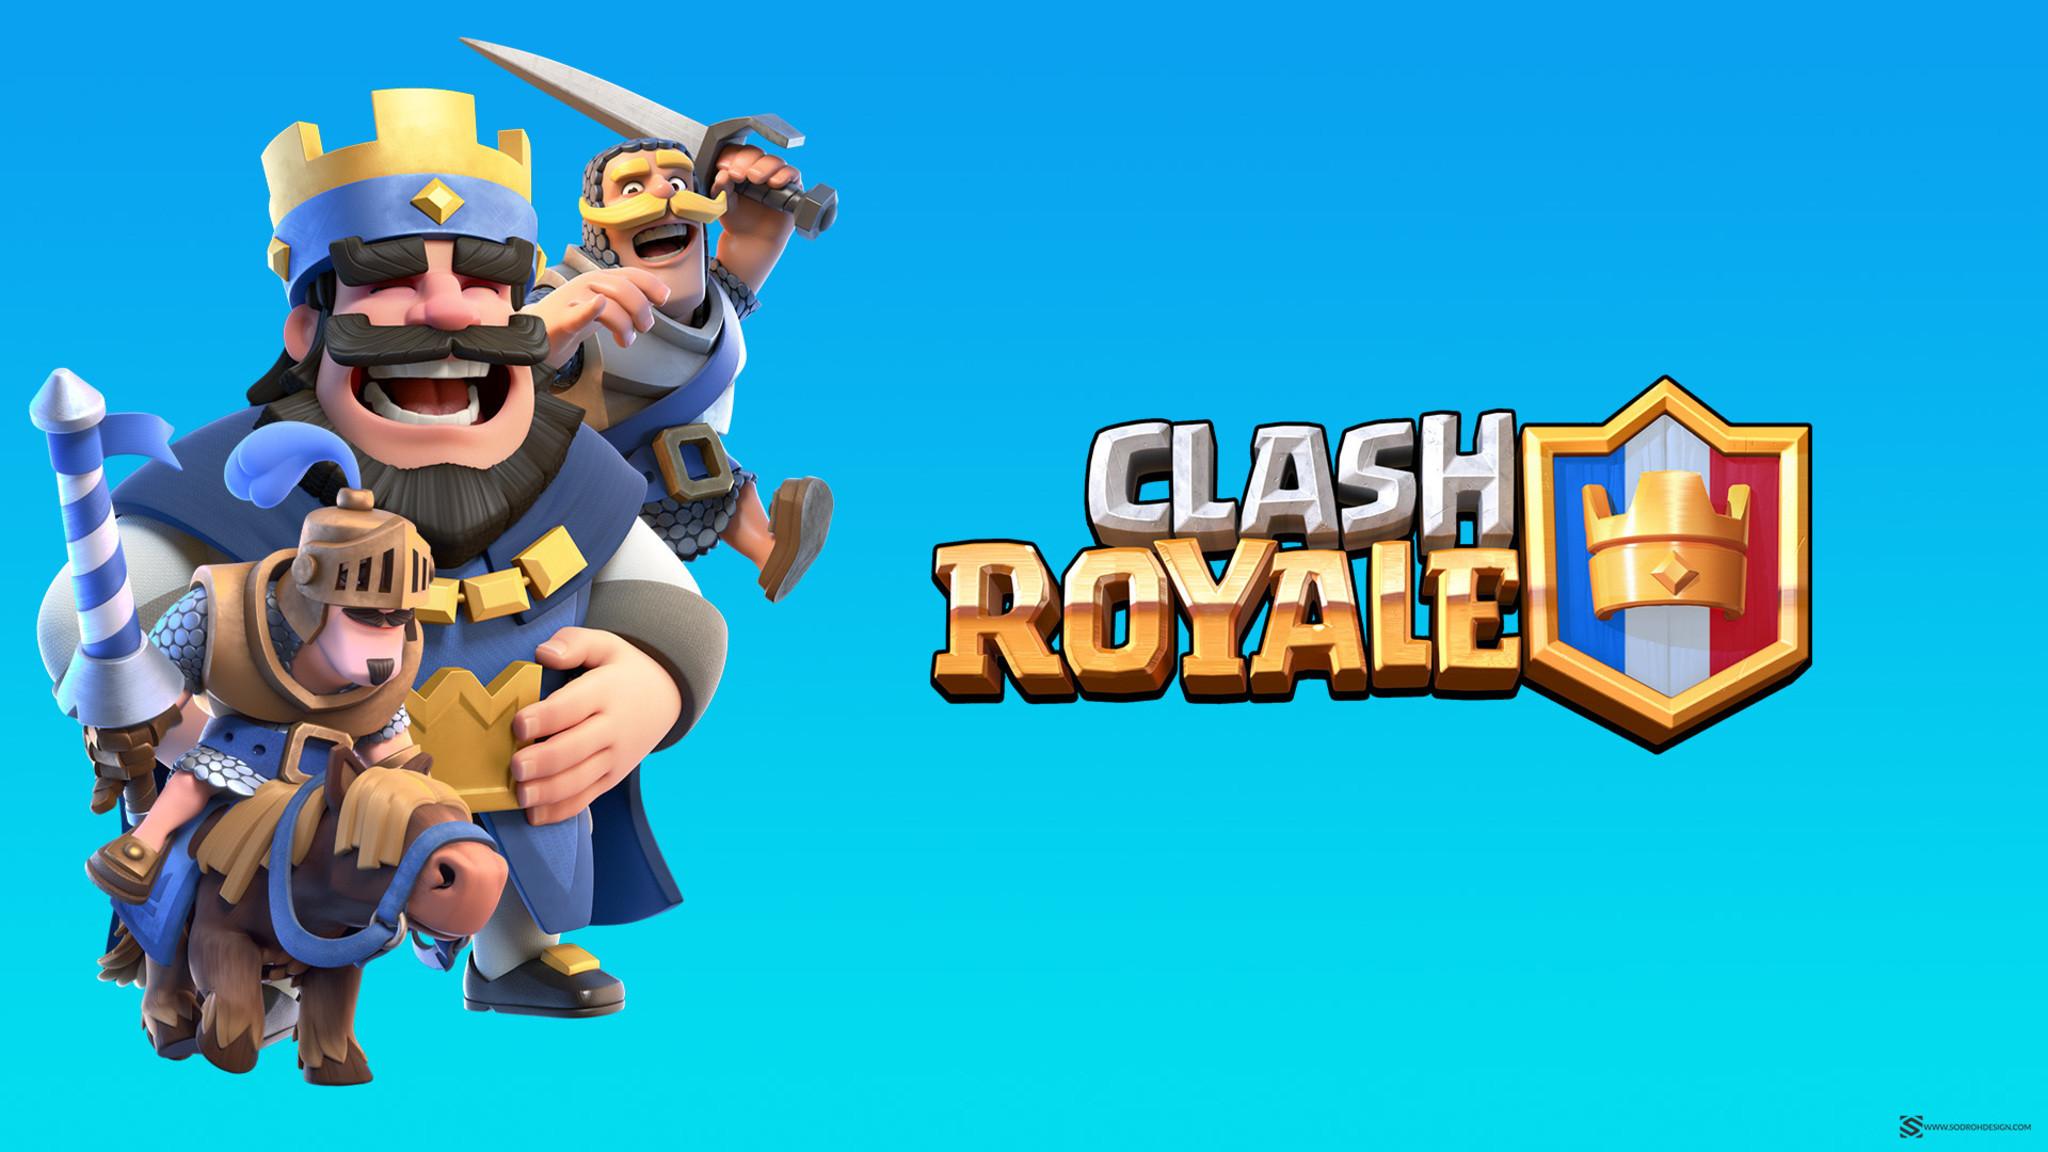 Download Clash Royale Desktop HD 4k Wallpapers In Screen  Resolution